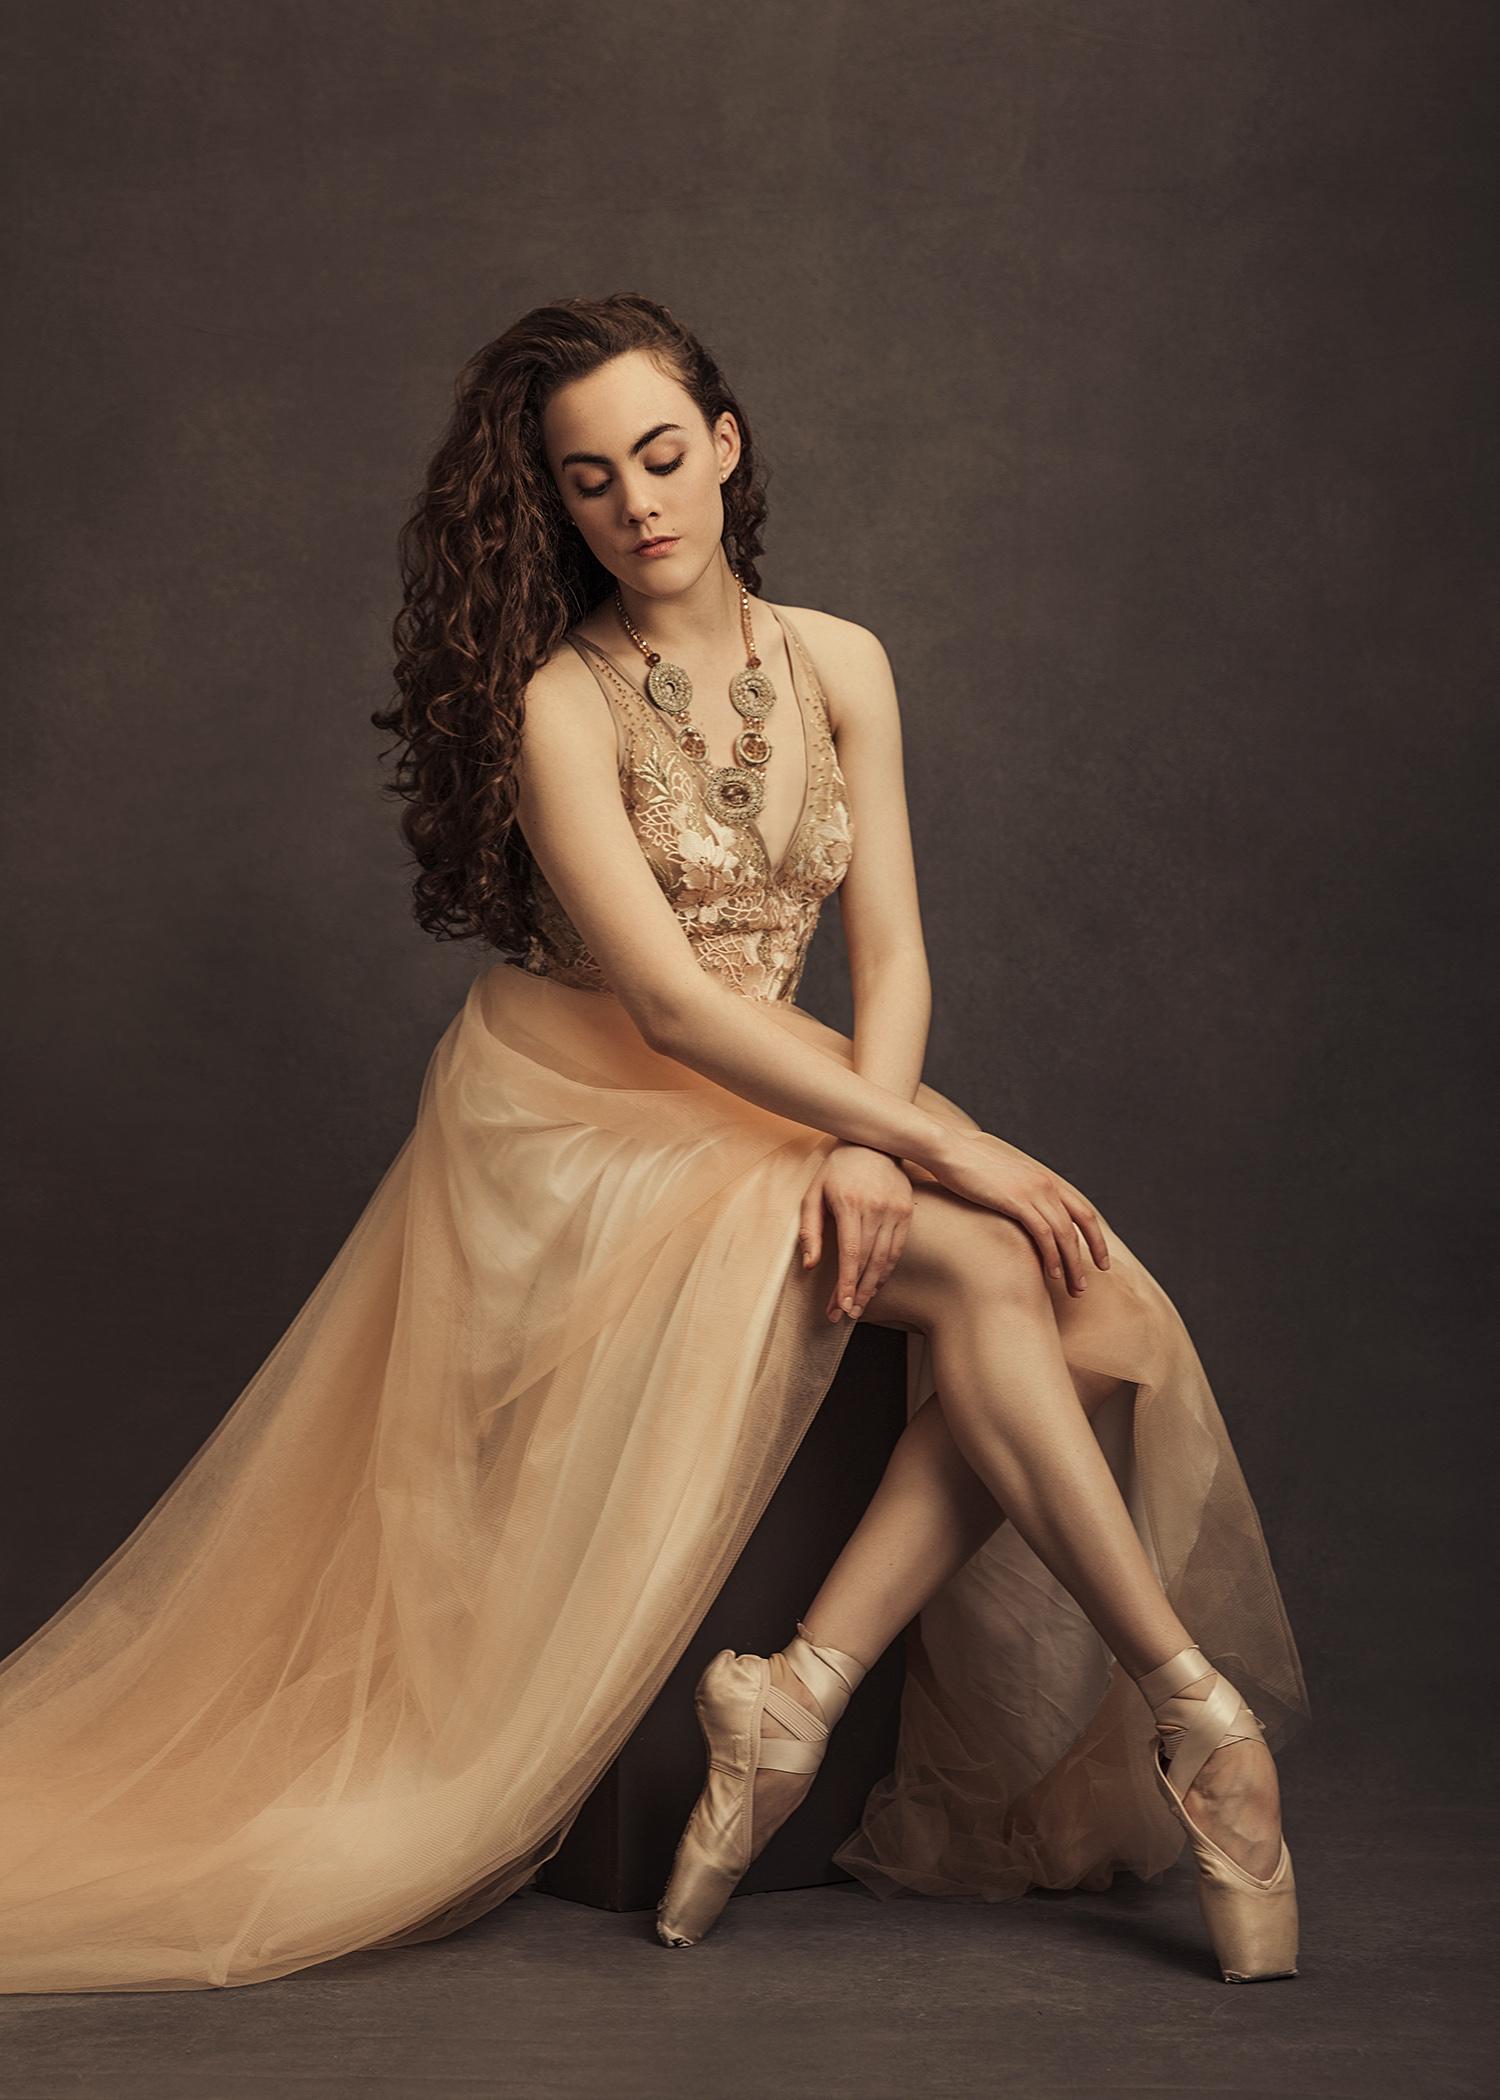 Portrait of a Dancer by Sacramento Photographer Mayumi Acosta.jpg